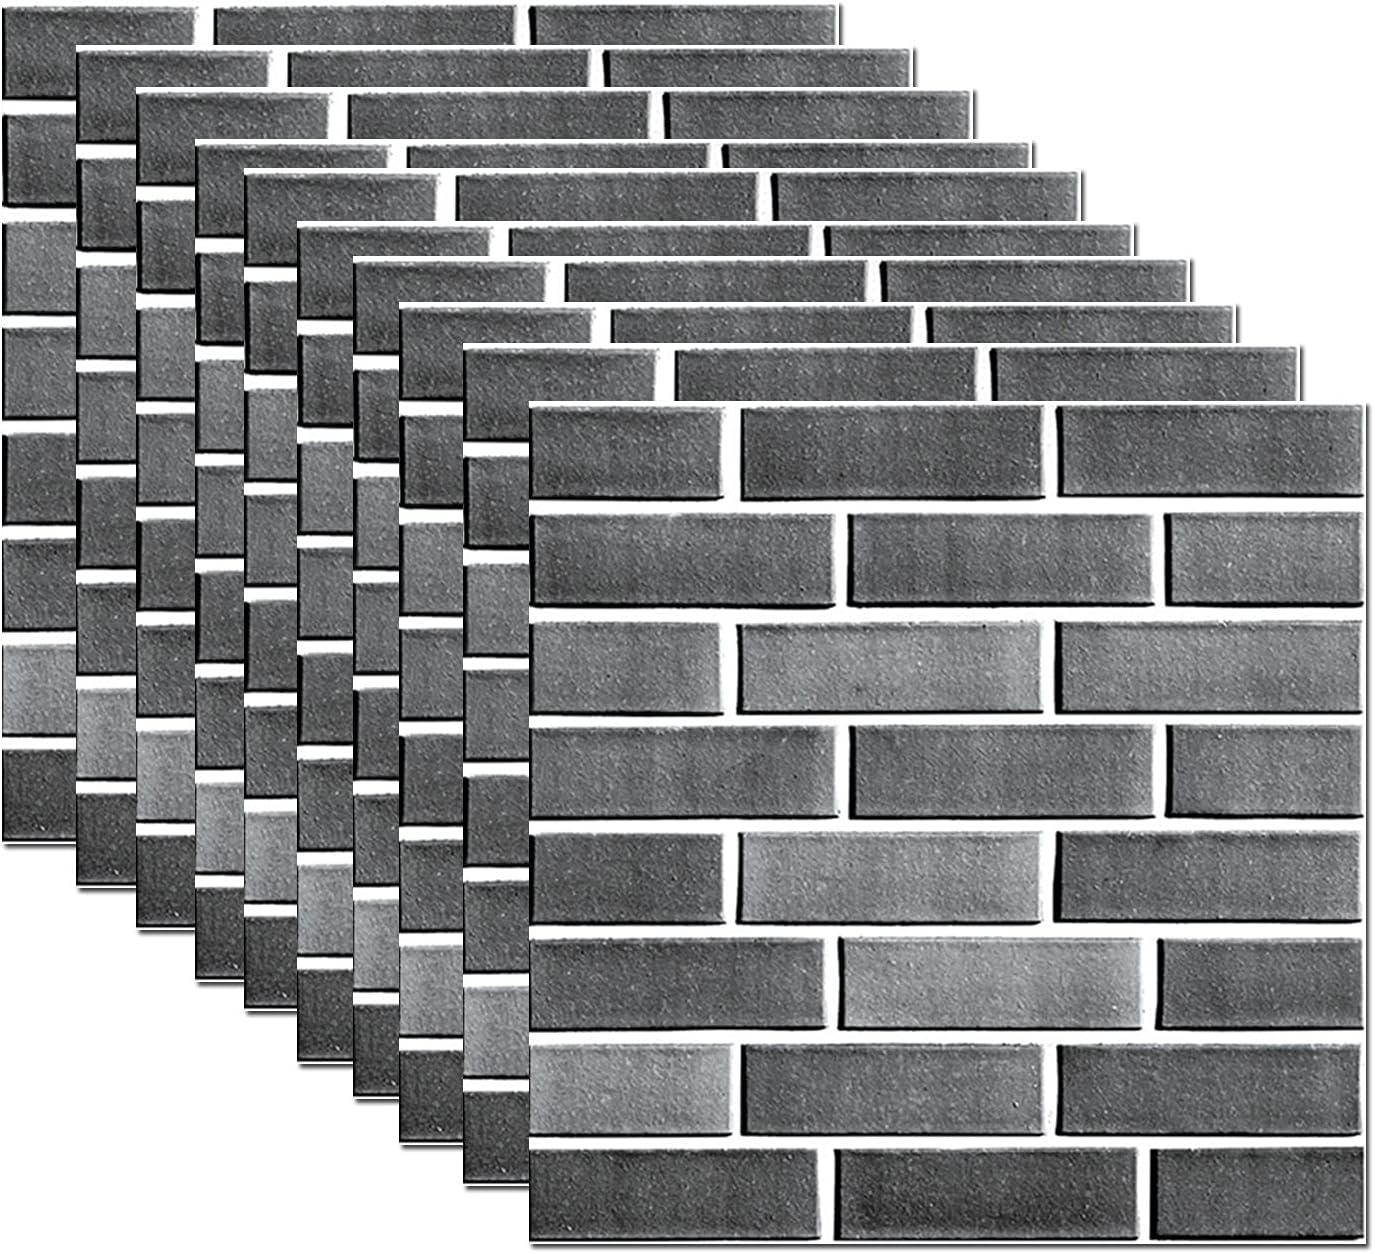 3D Tile Brick Wall Sticker Self-adhesive 3D Foam Wall Panels Pee